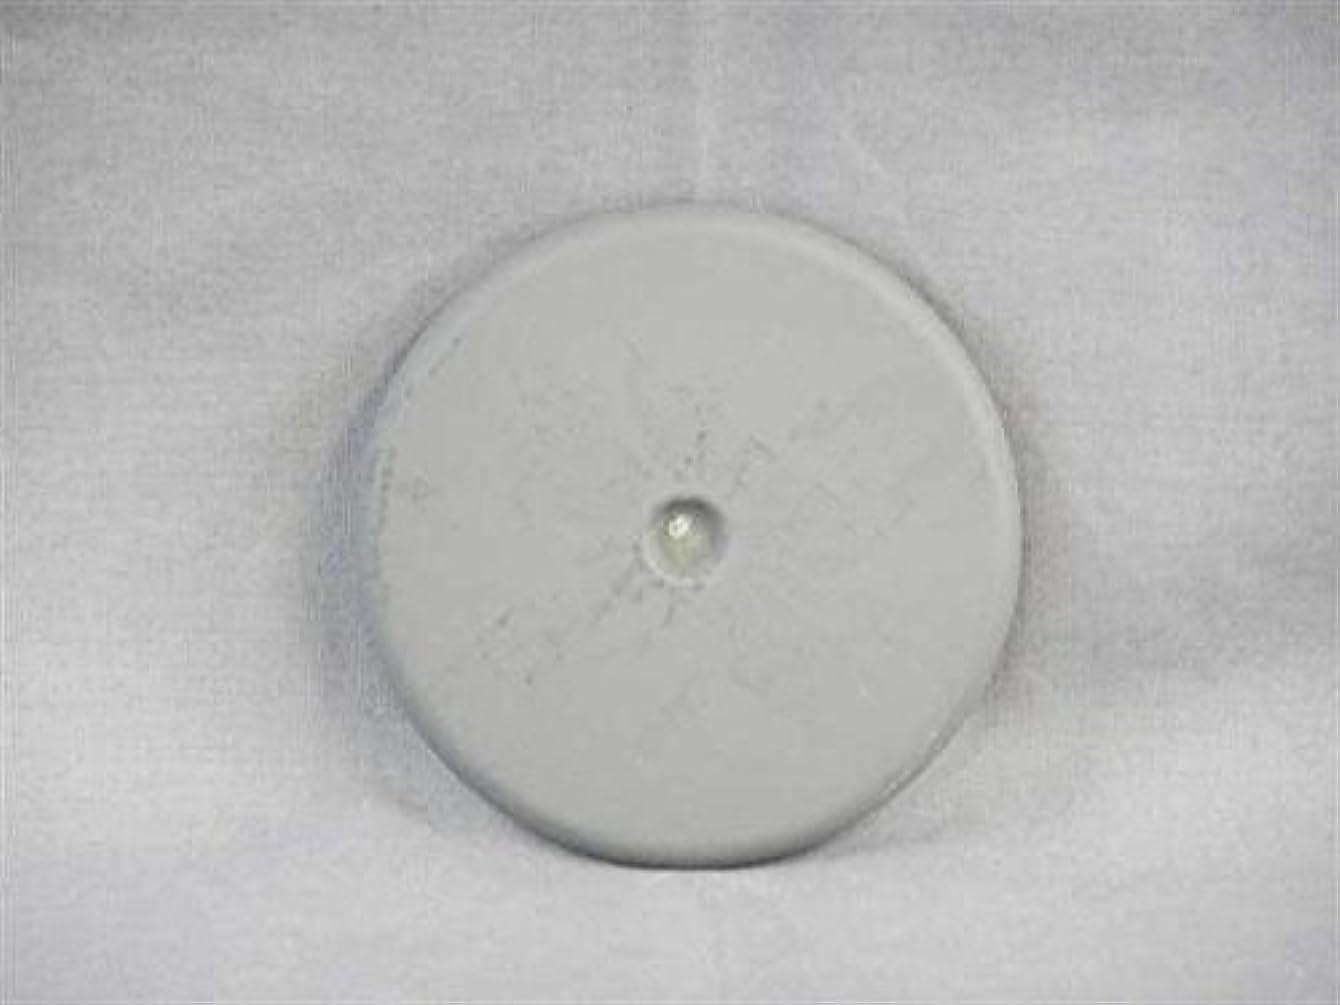 Recertified KitchenAid 8286155CG Cooktop Medium Burner Cap Assembly D-4